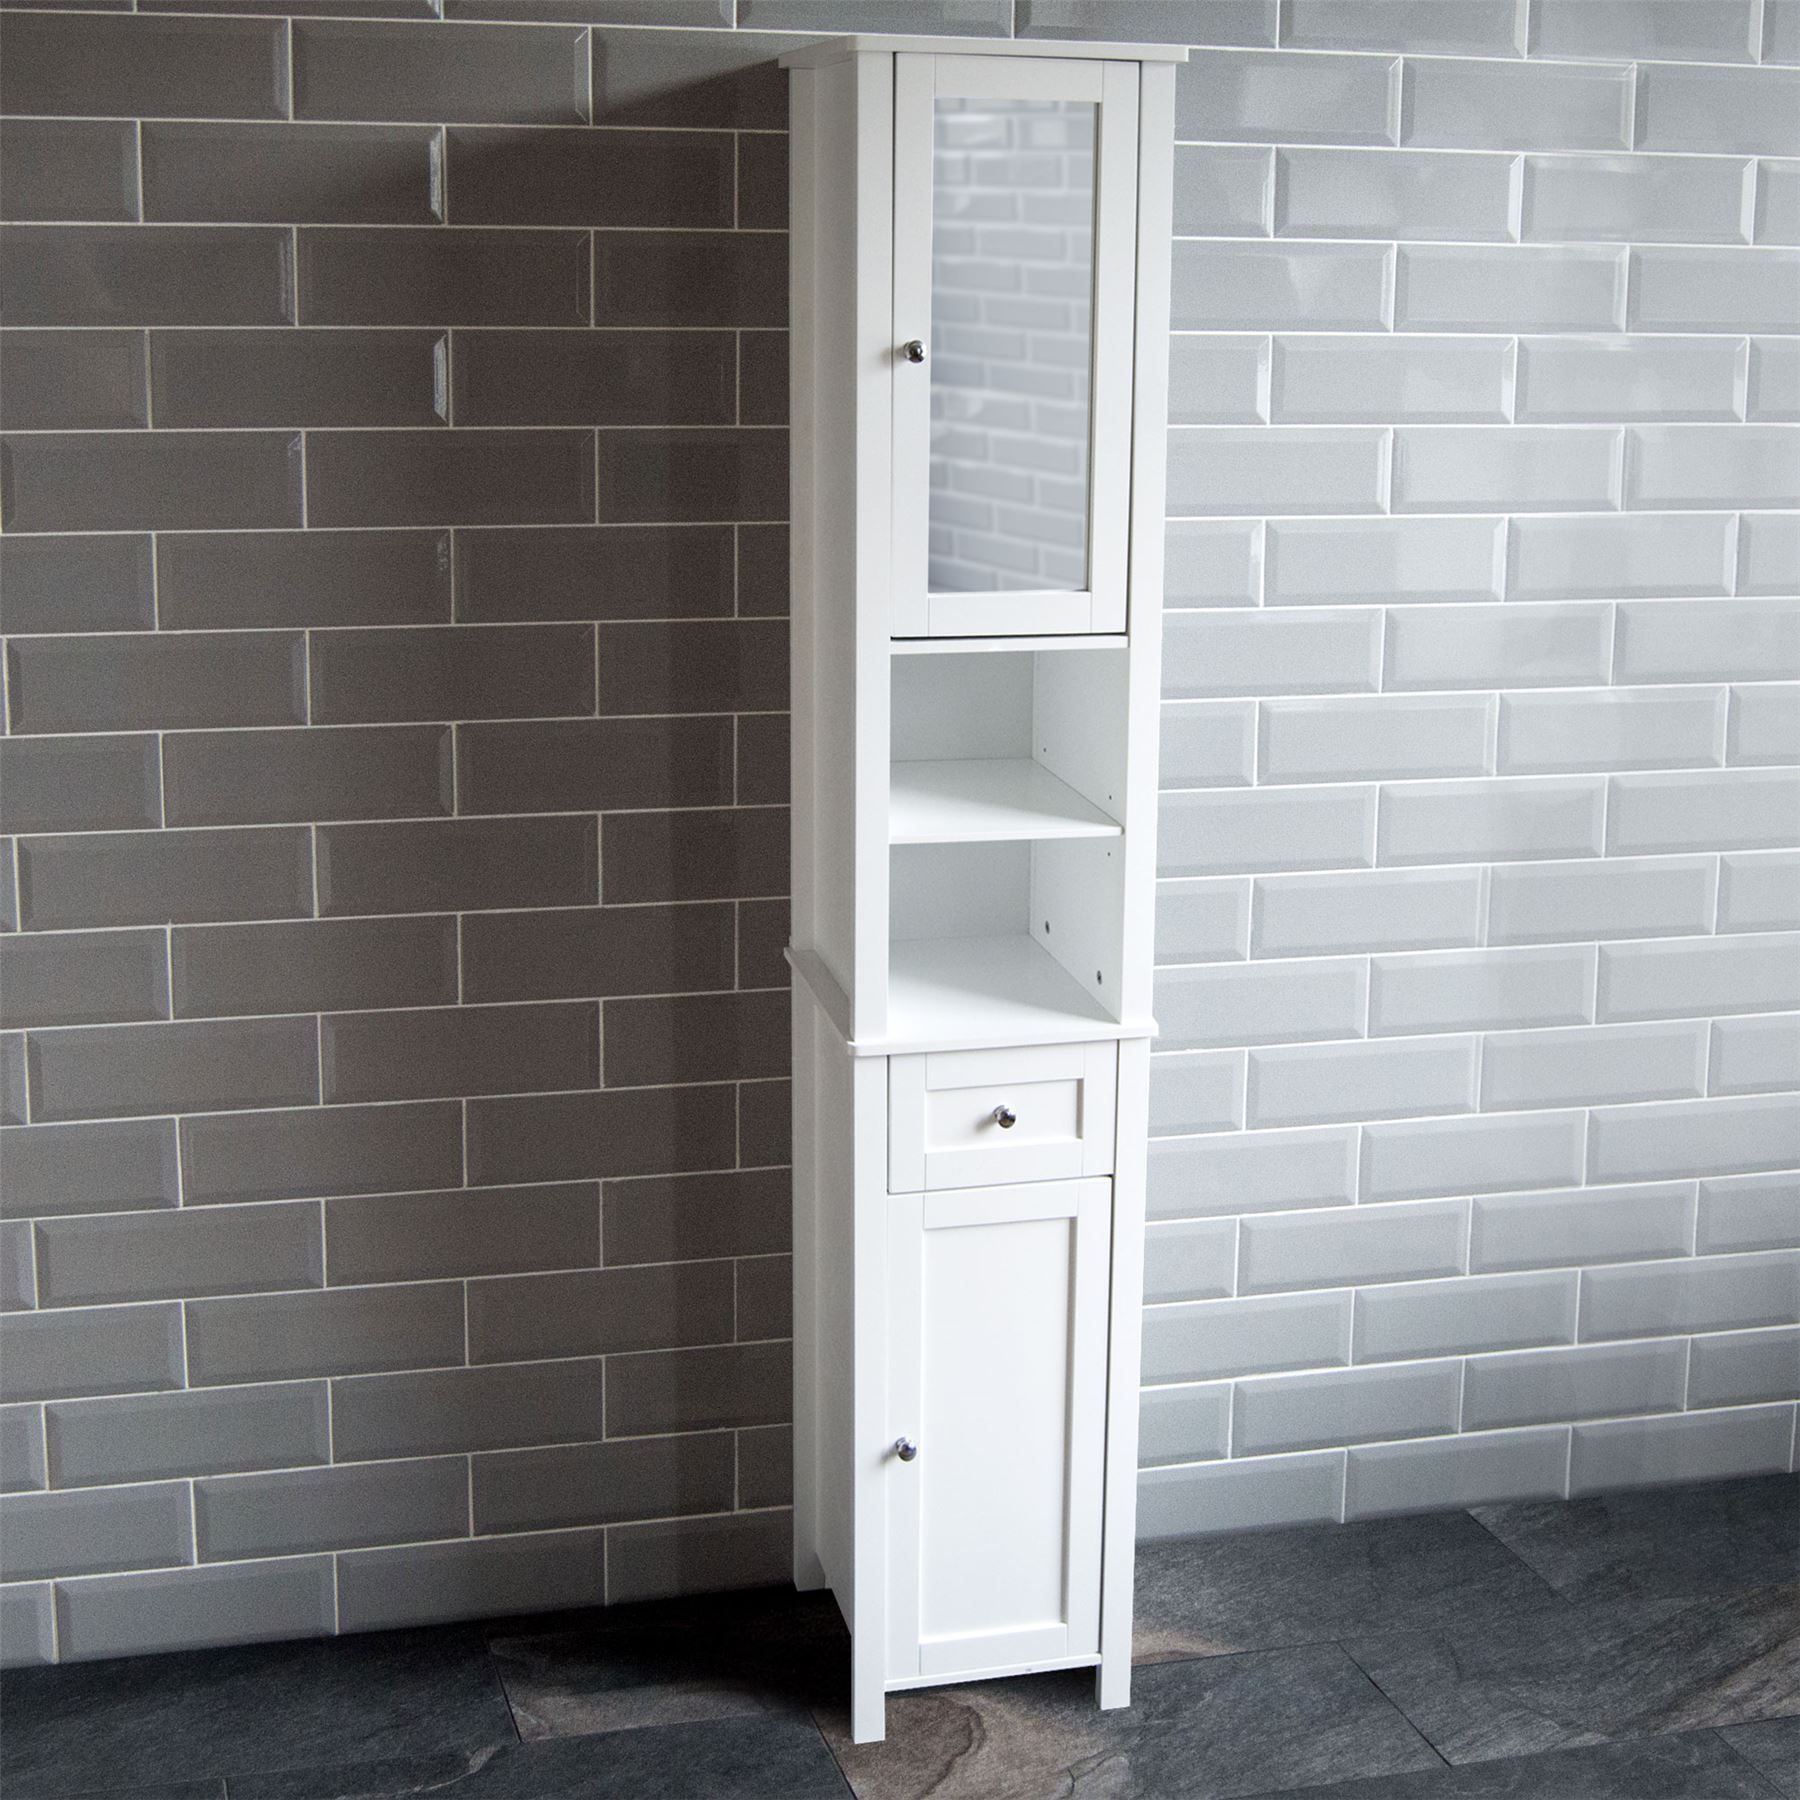 Bathroom Cabinet Single Double Door Wall Mounted Tallboy Cupboard Mdf White Grey Ebay Bathroom Tall Cabinet Tall Bathroom Storage Tall Bathroom Storage Cabinet